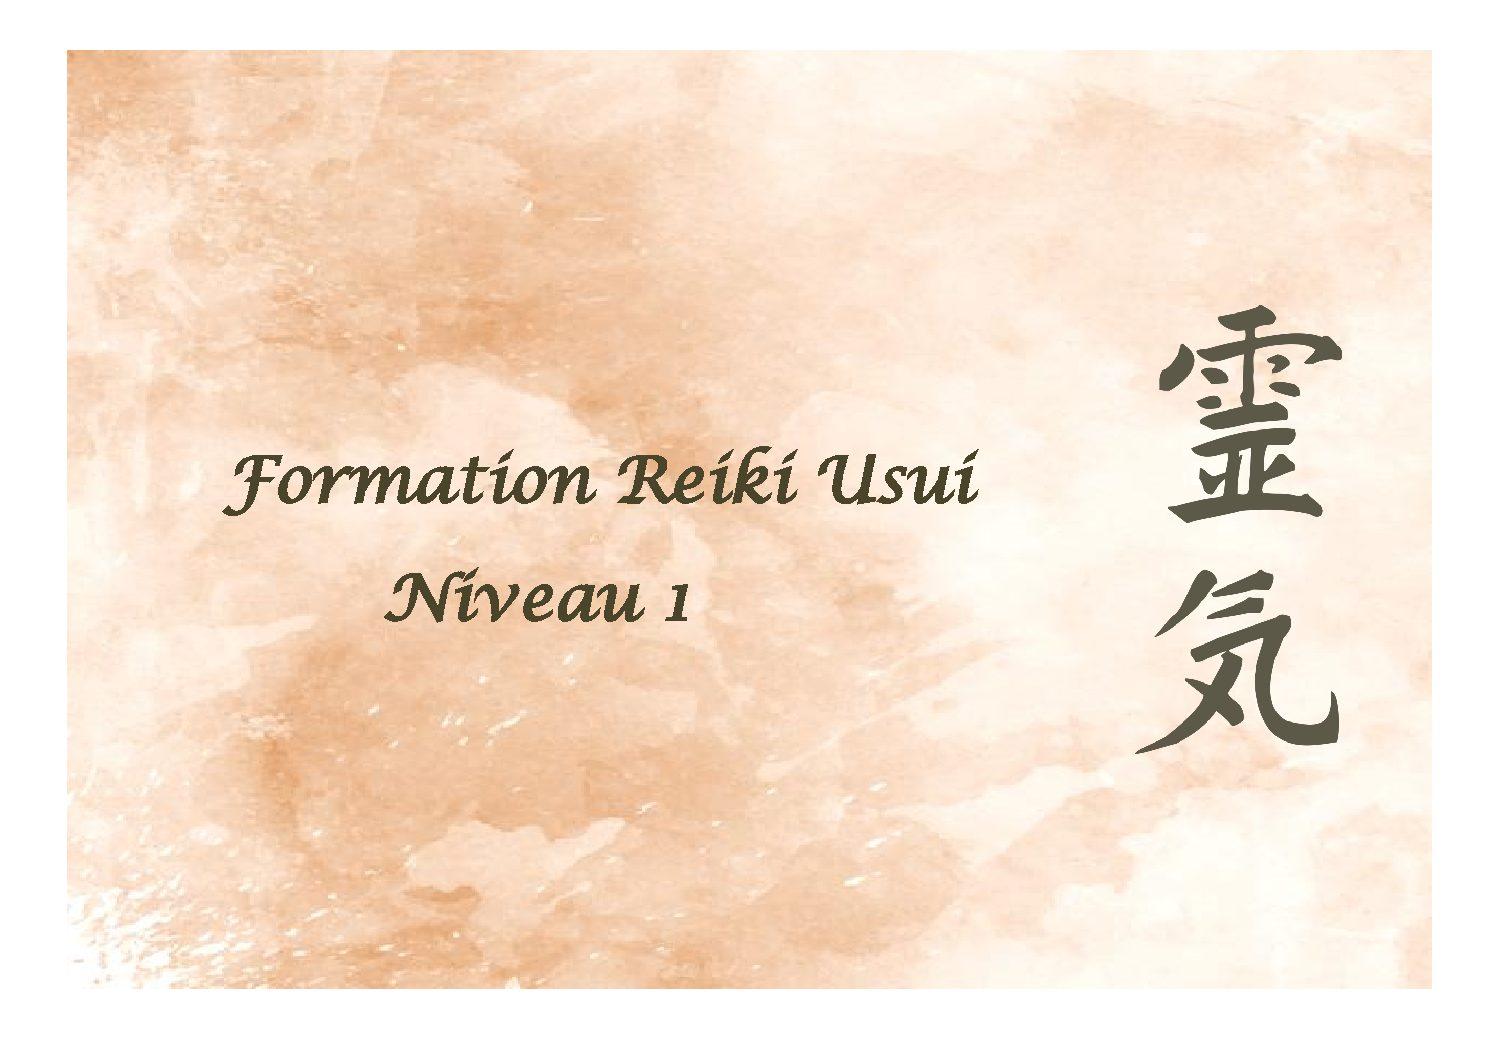 Formation Reiki Usui - Niveau 1